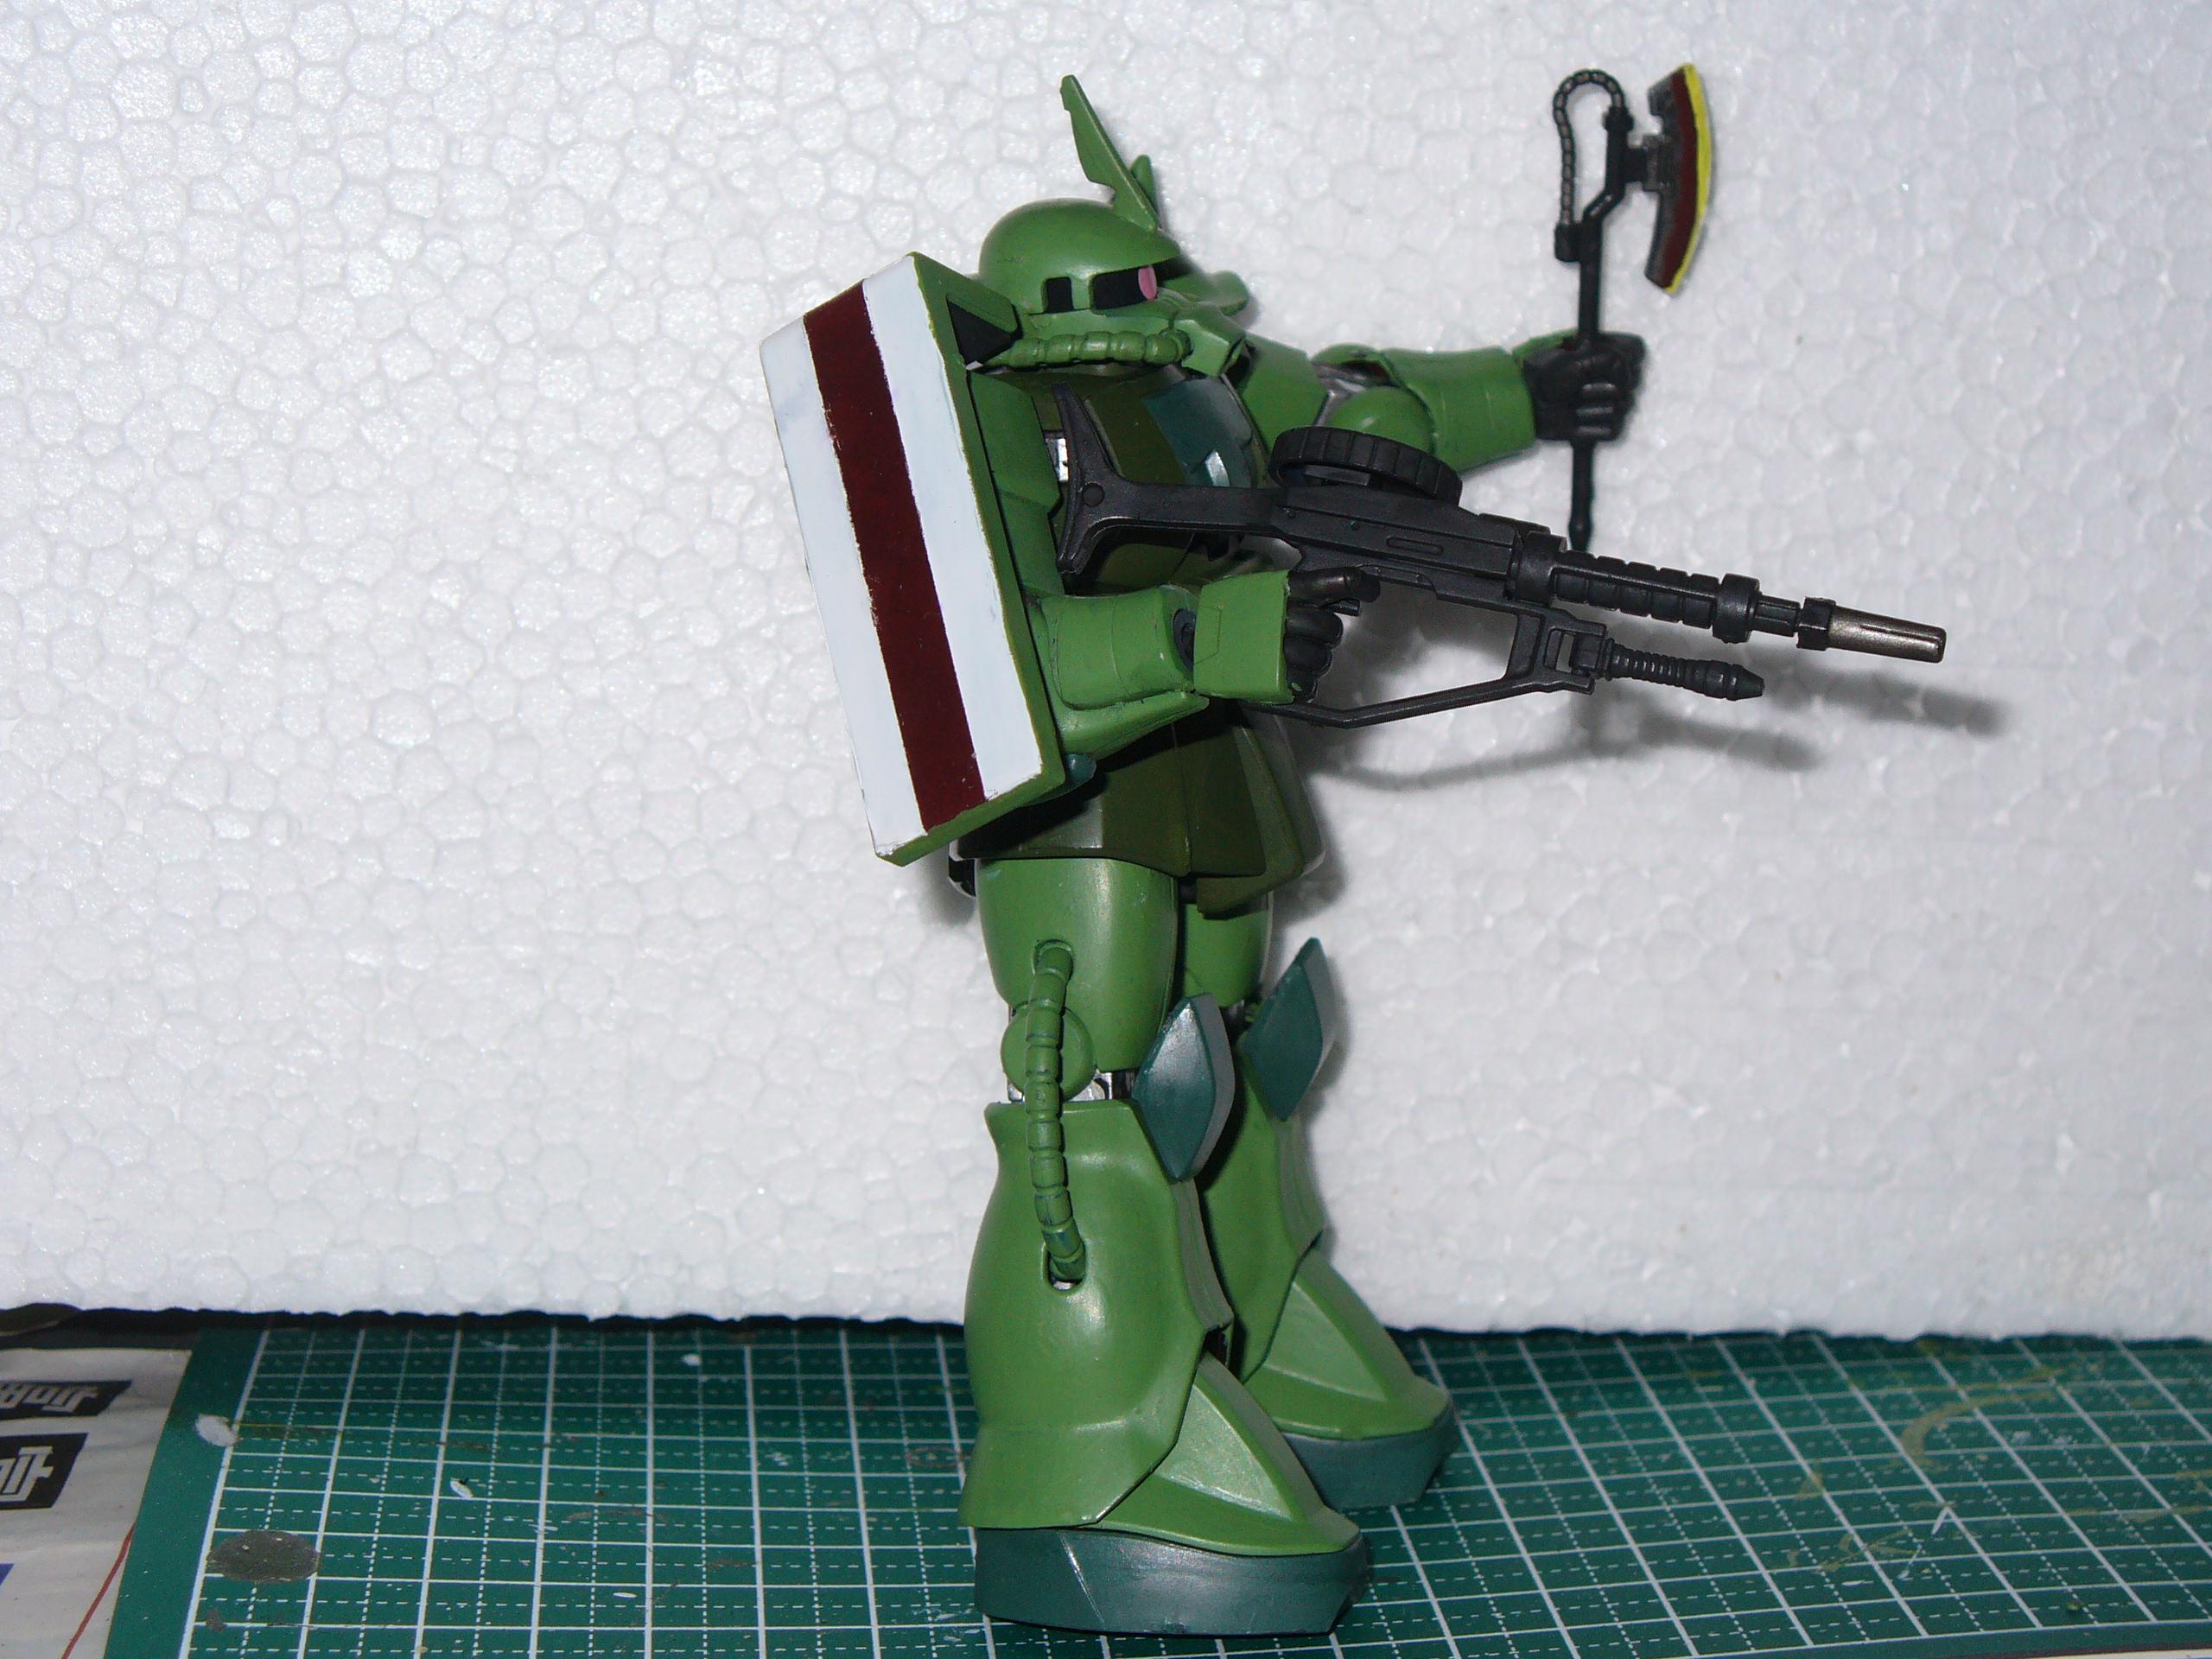 1:144, Gundam, Mecha, Mobile Suit, Zaku, Zeon